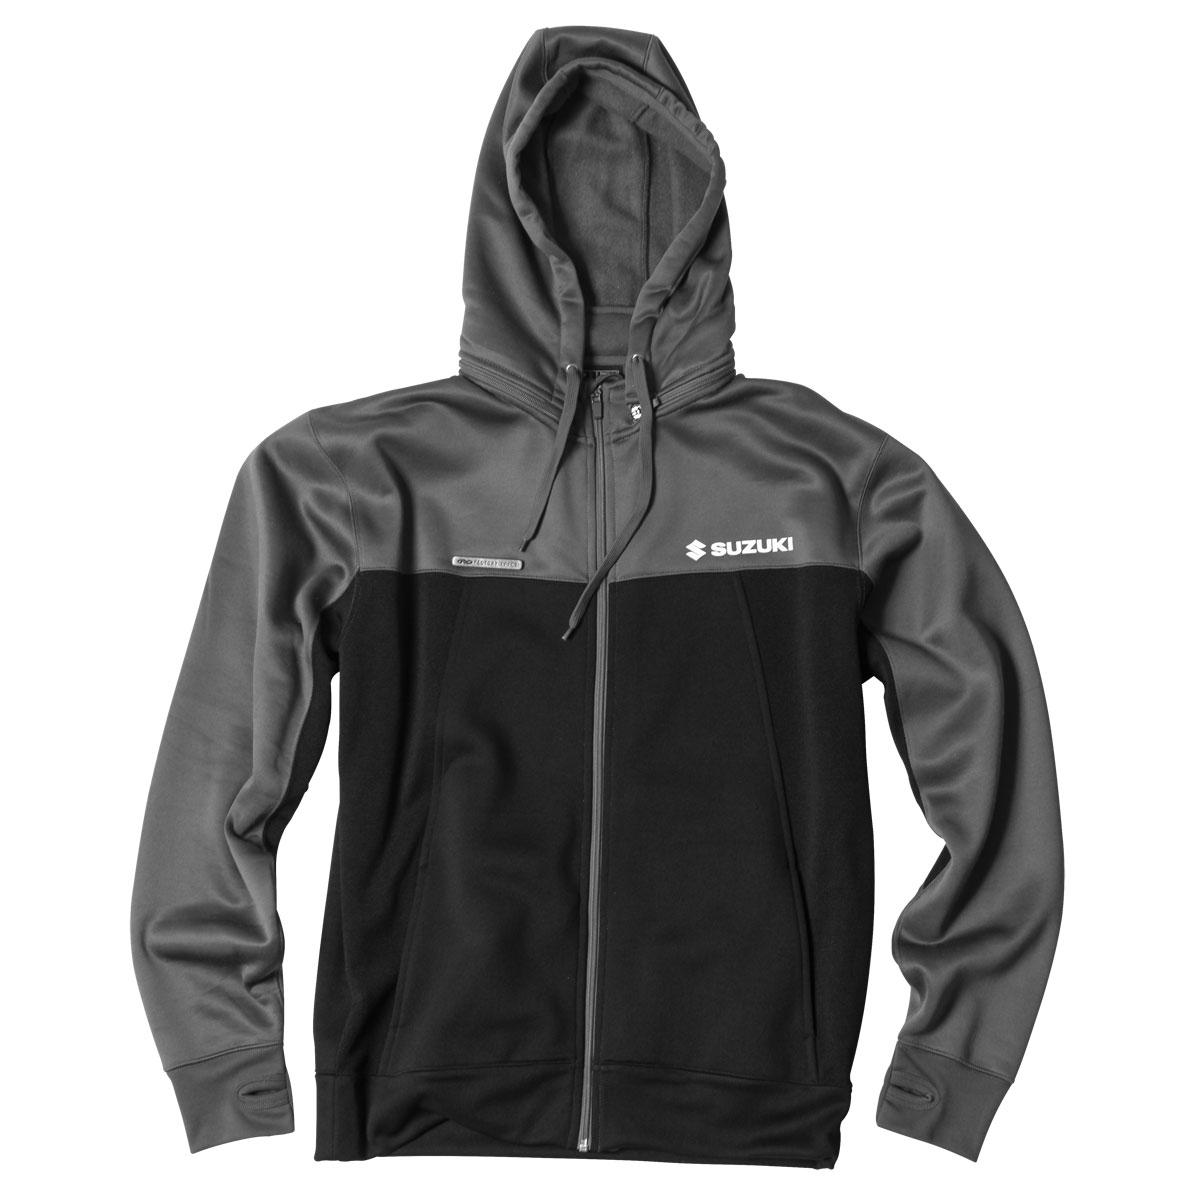 Factory Effex Men's Suzuki Tracker Gray/Black Fleece Jacket